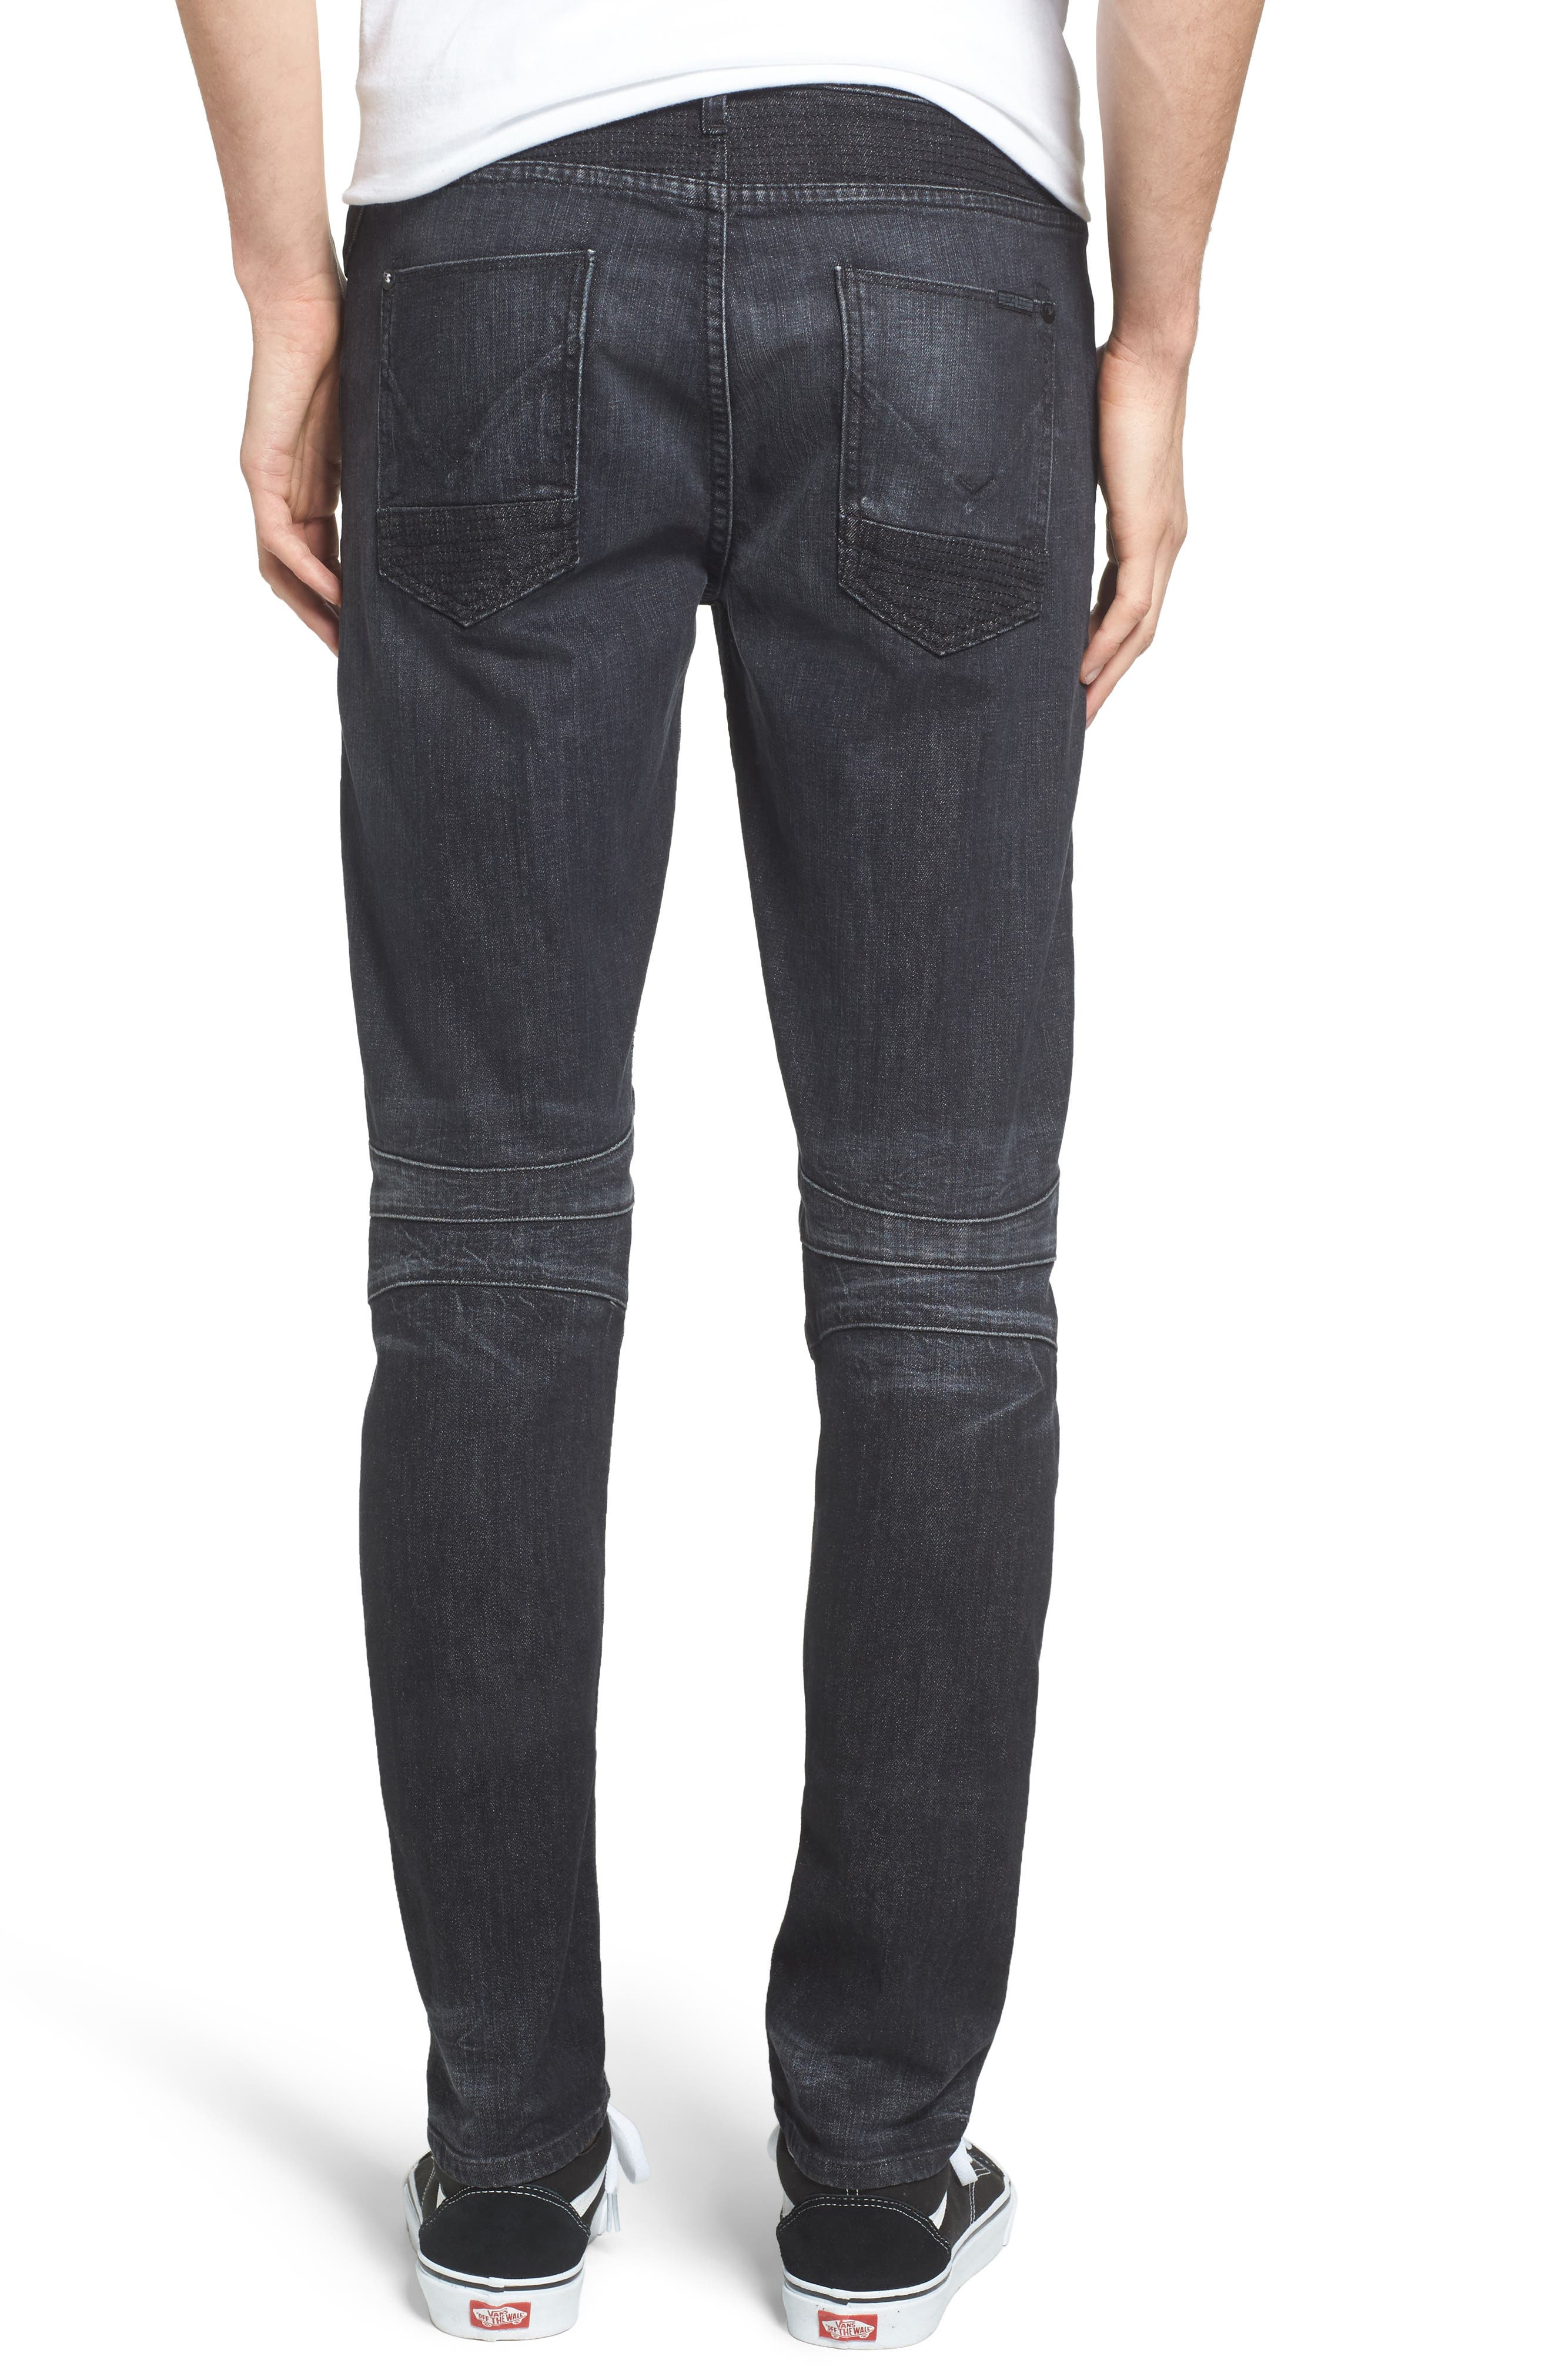 Blinder Skinny Fit Moto Jeans,                             Alternate thumbnail 2, color,                             Sparring 2